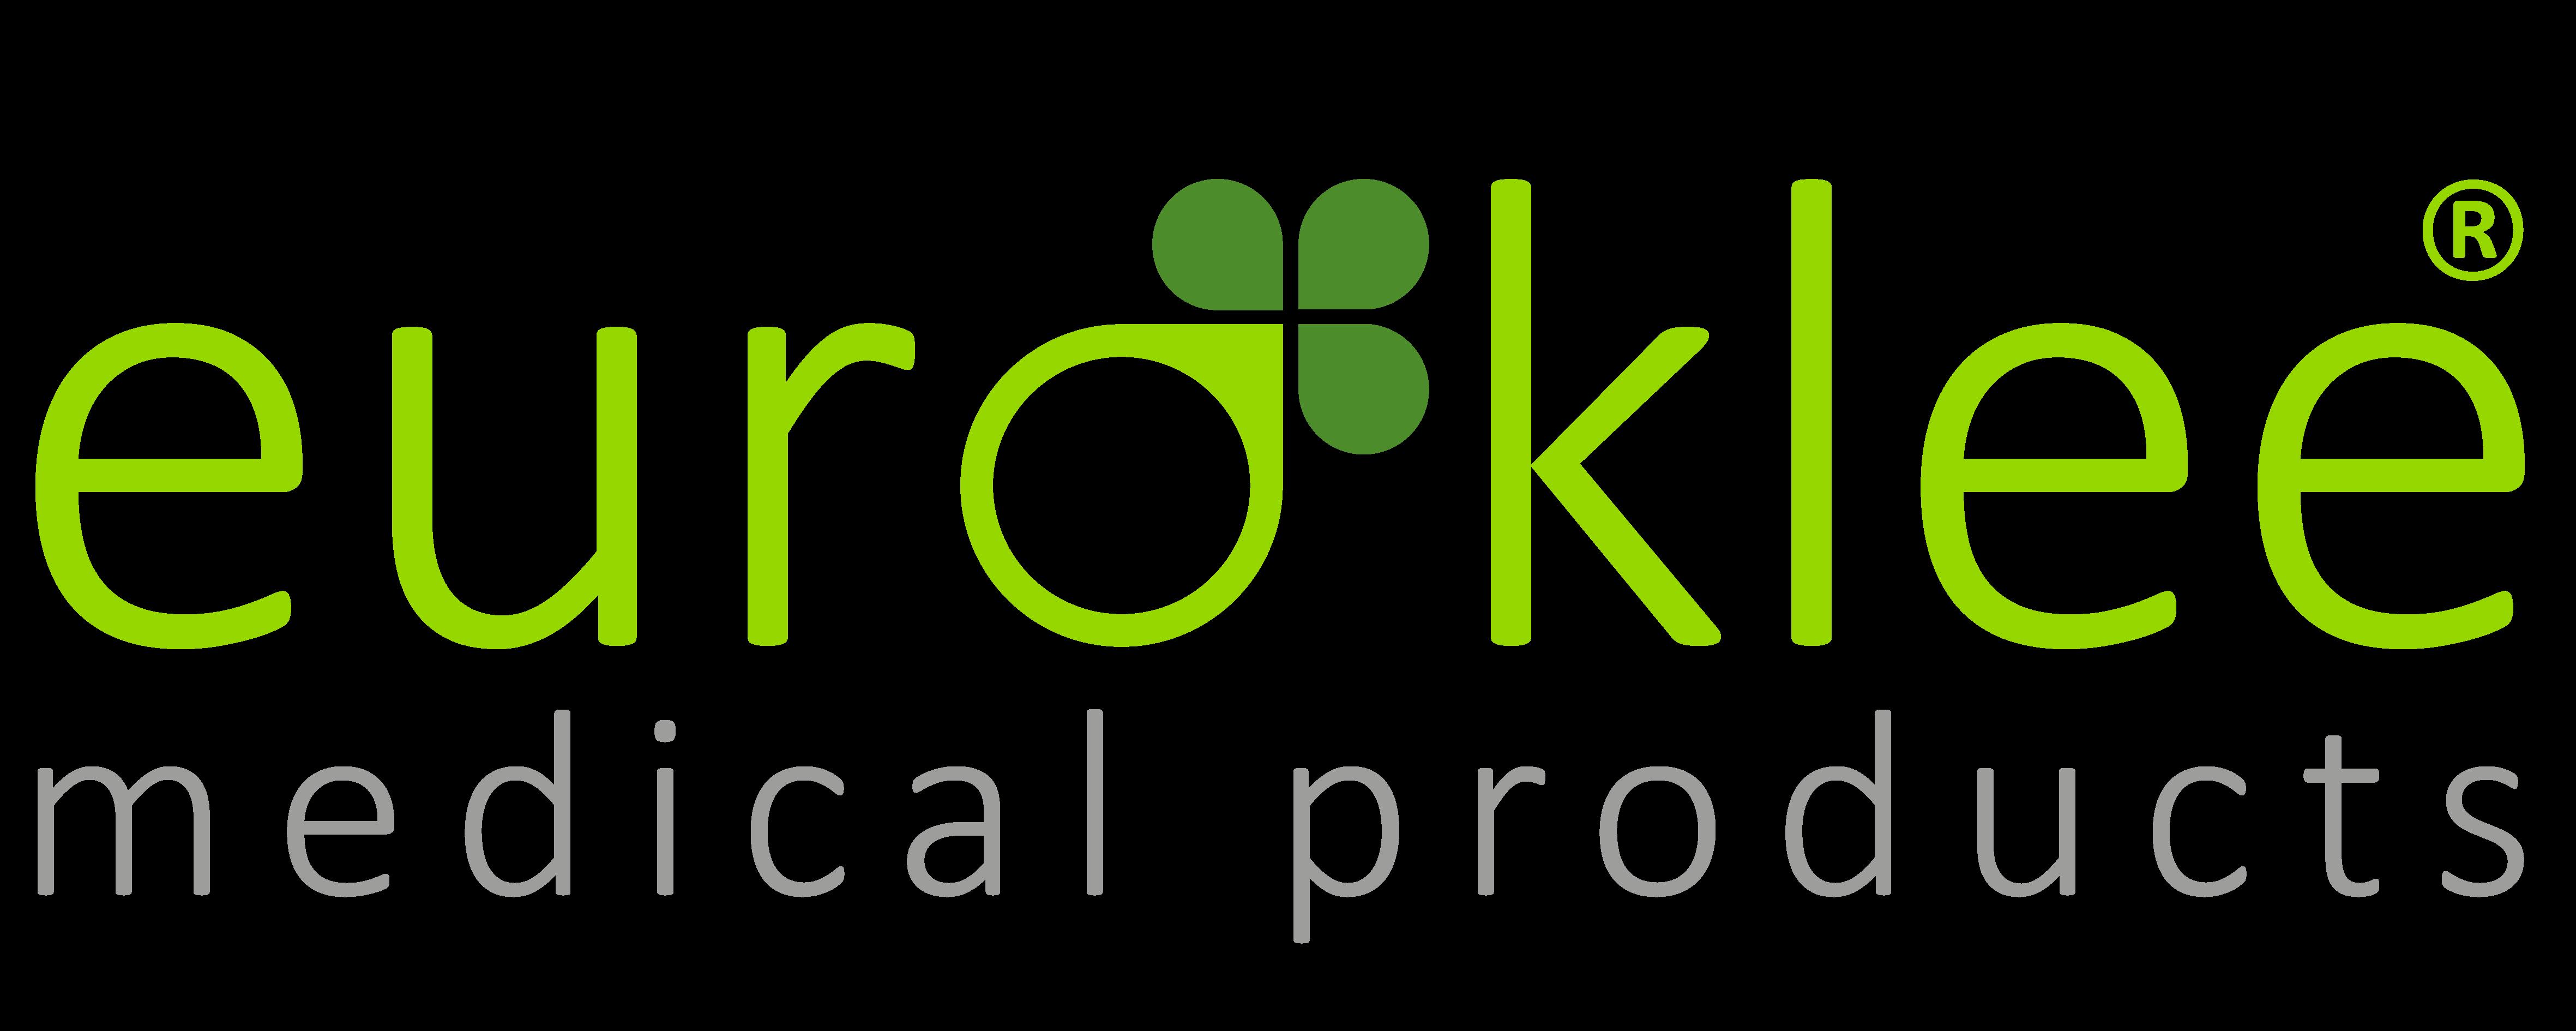 Logo empresa Euroklee medical products